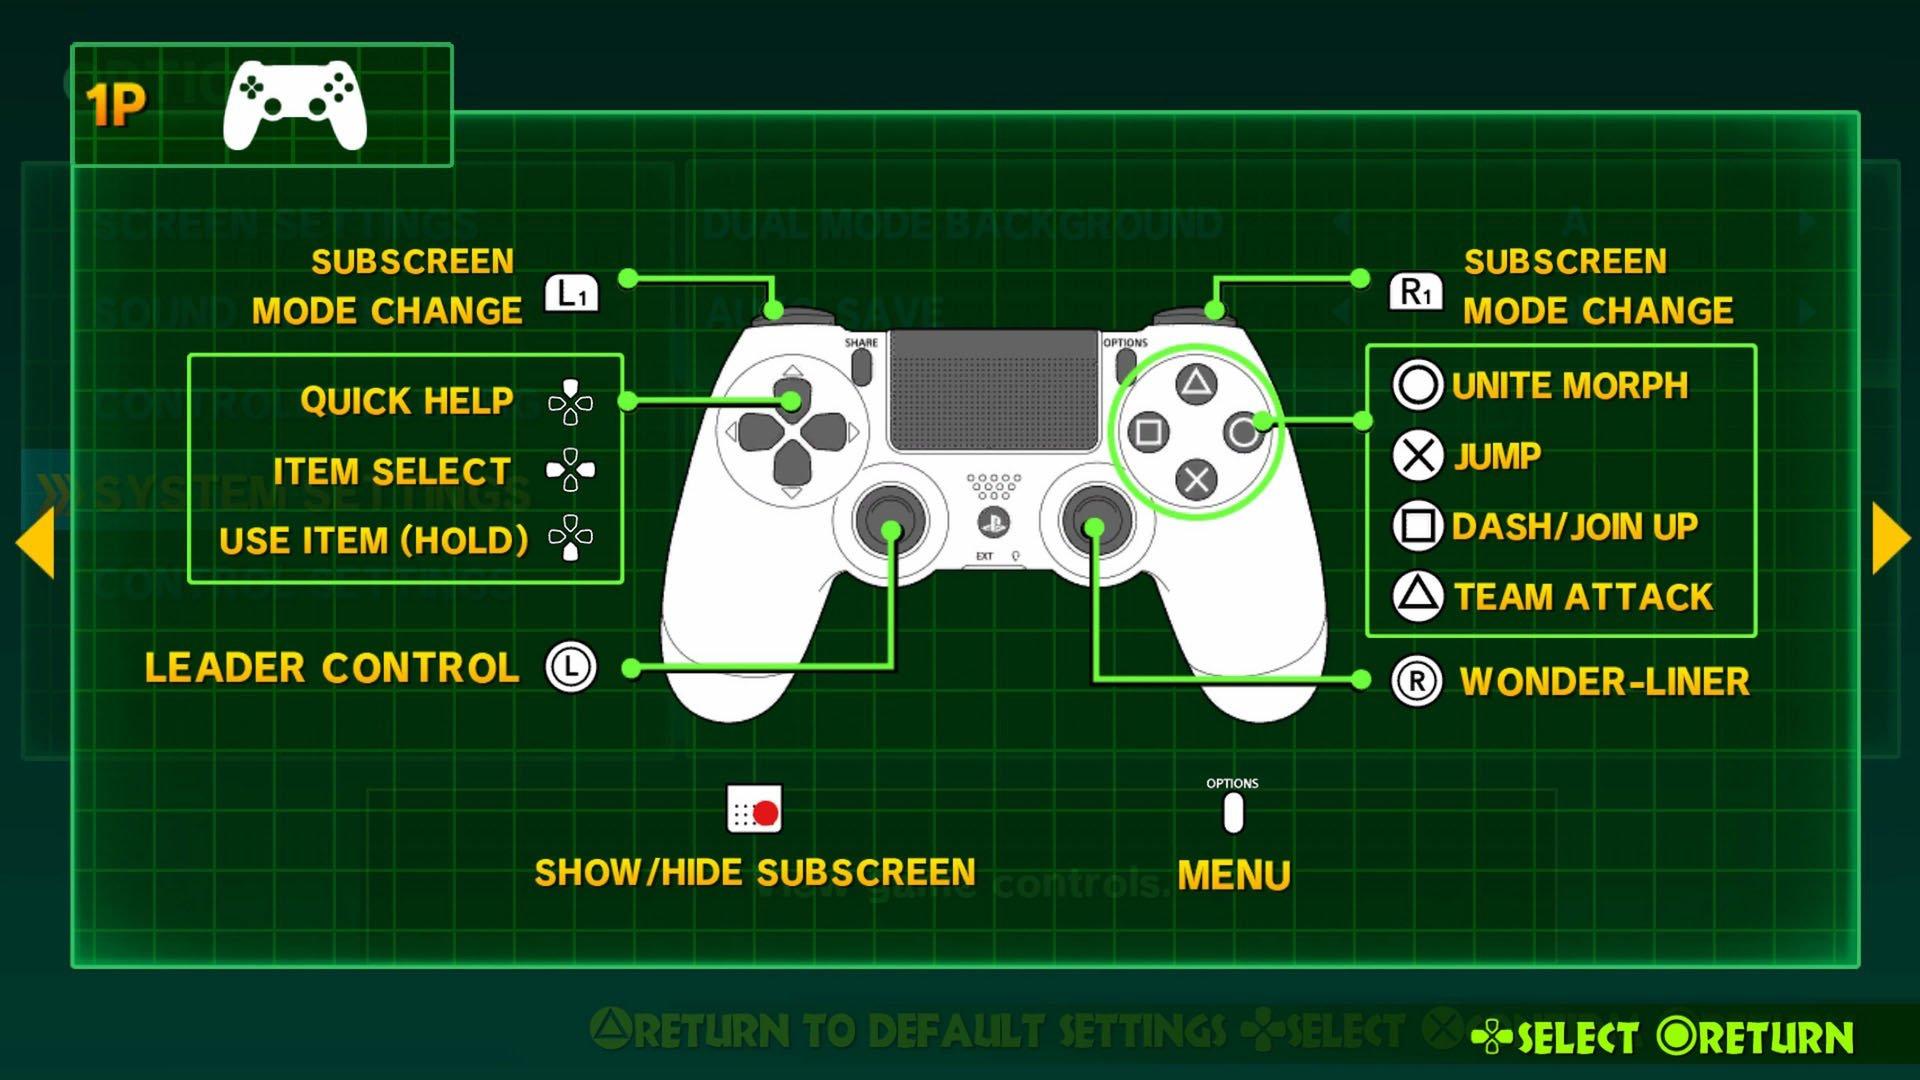 The Wonderful 101: Remastered controls